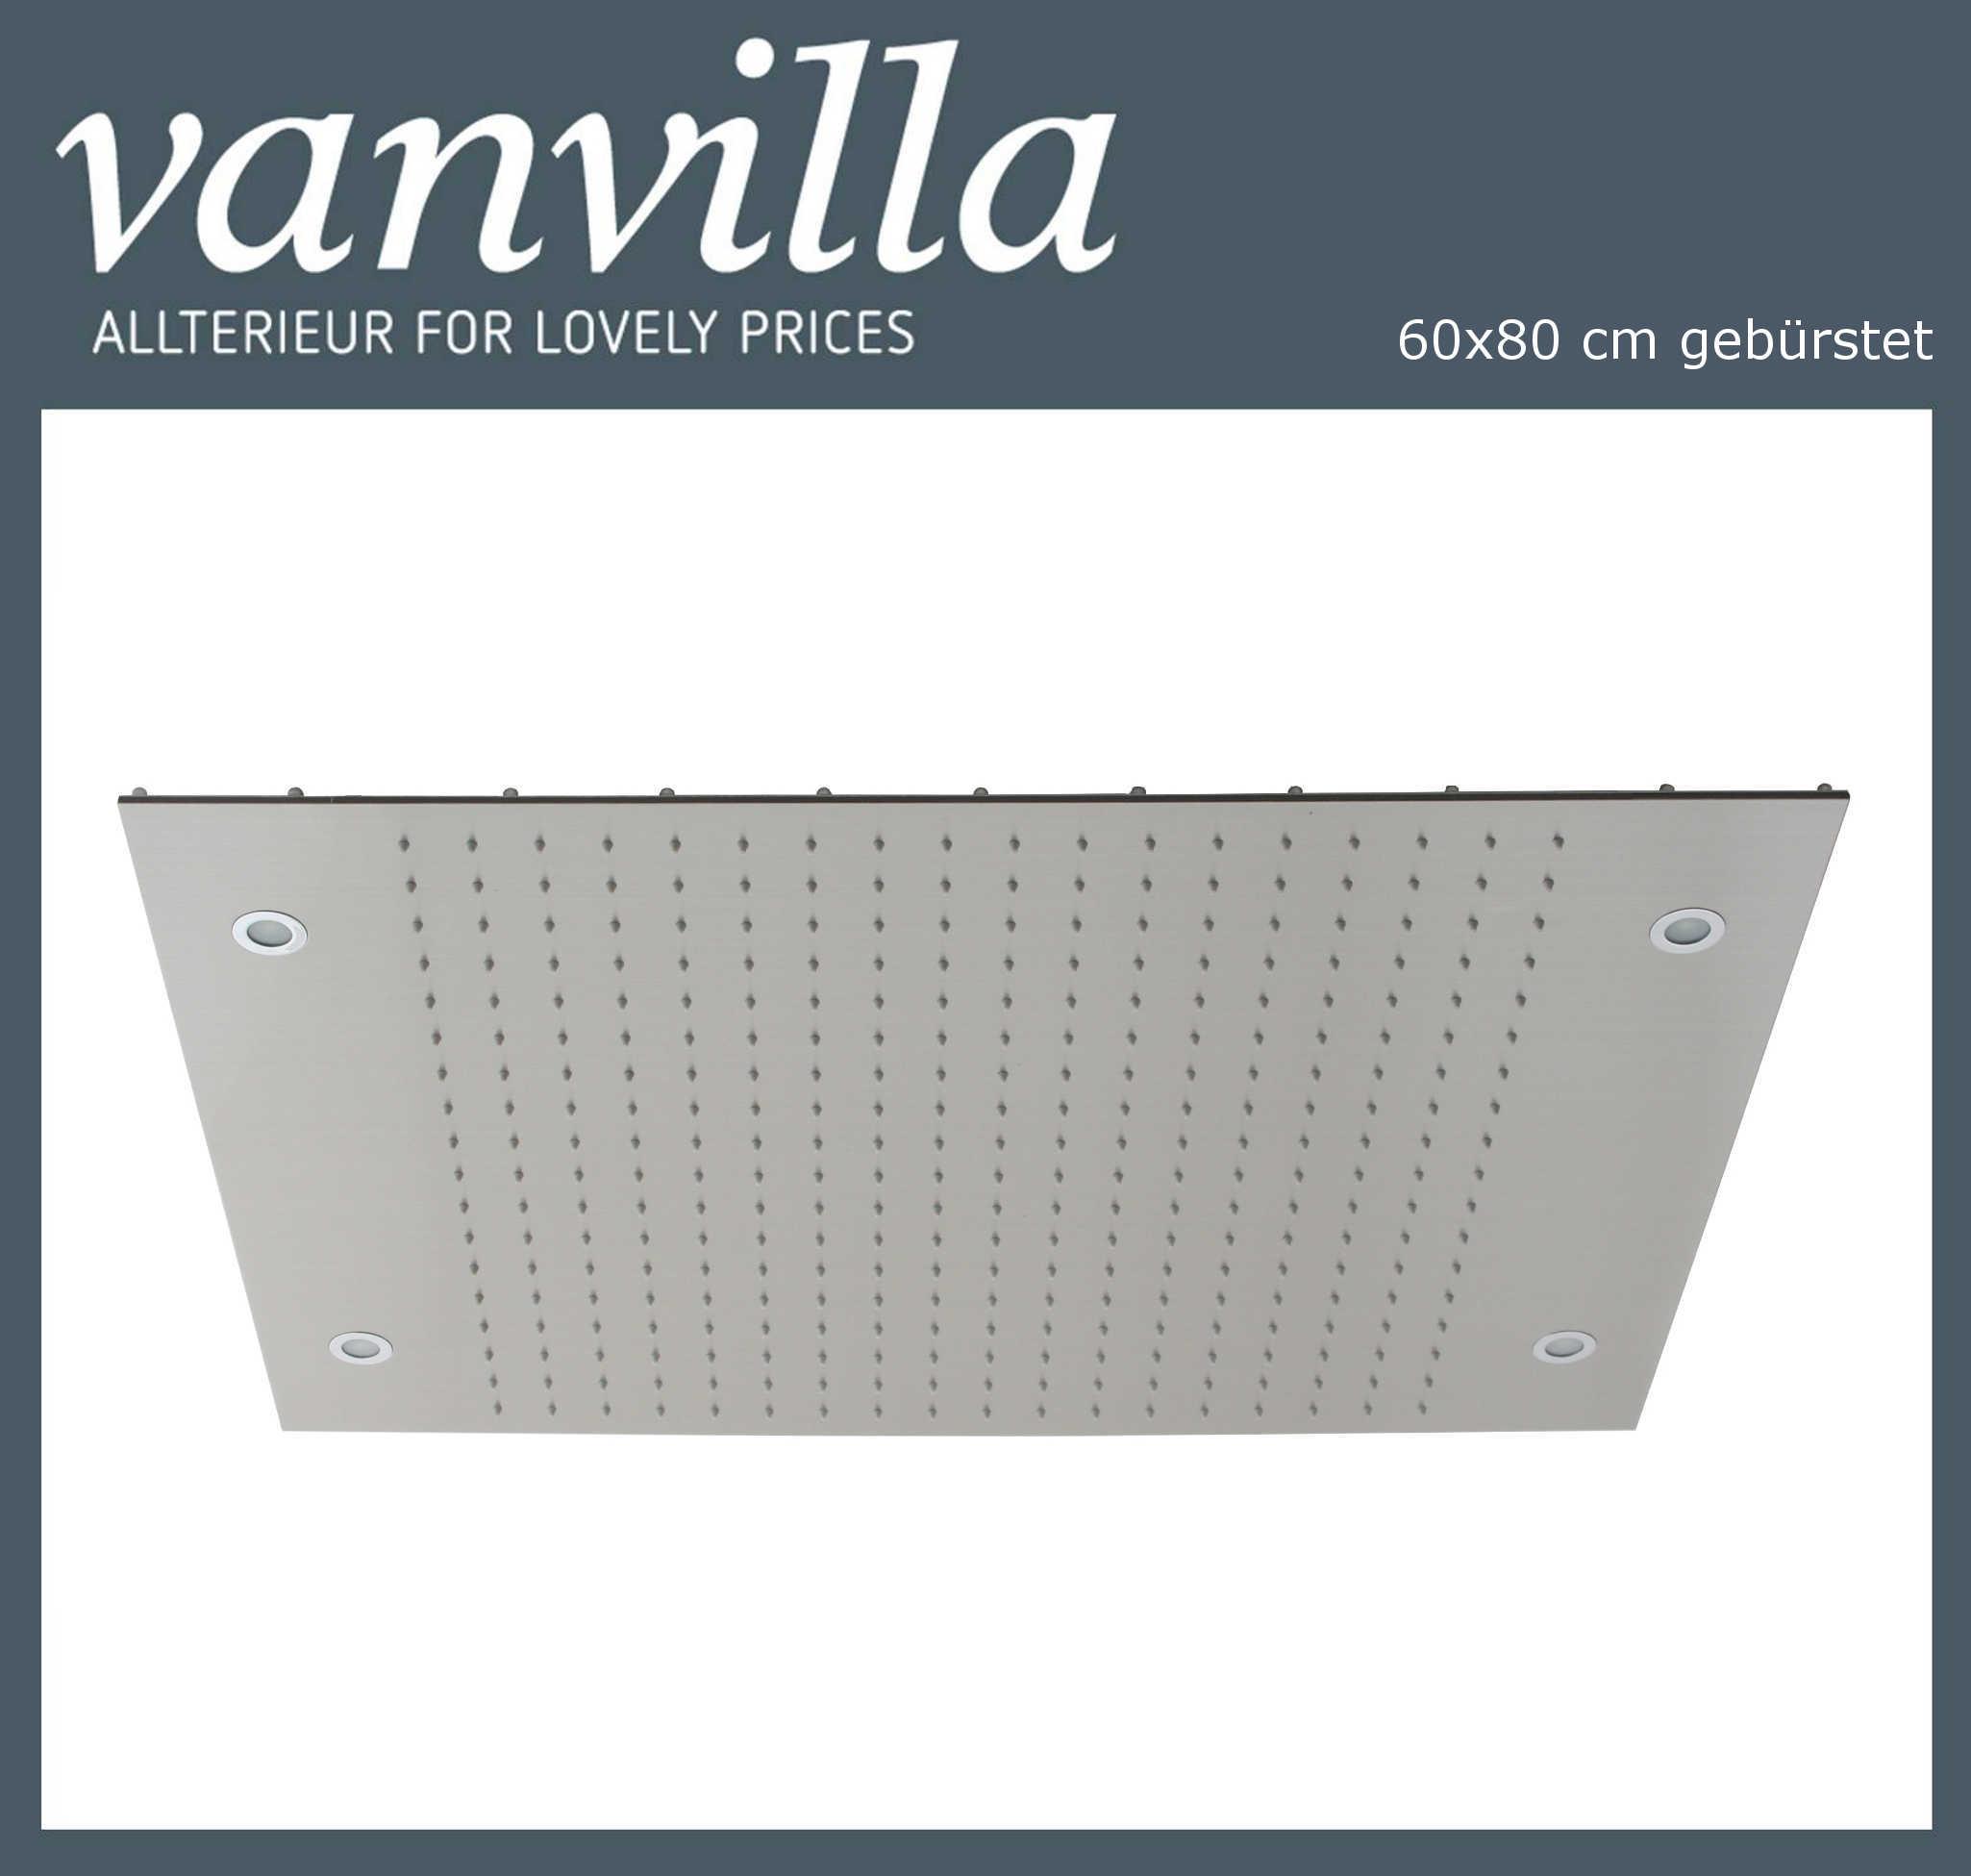 Duschkopf vanvilla LED 60cm x 80cm gebürstet 116080W-B LED